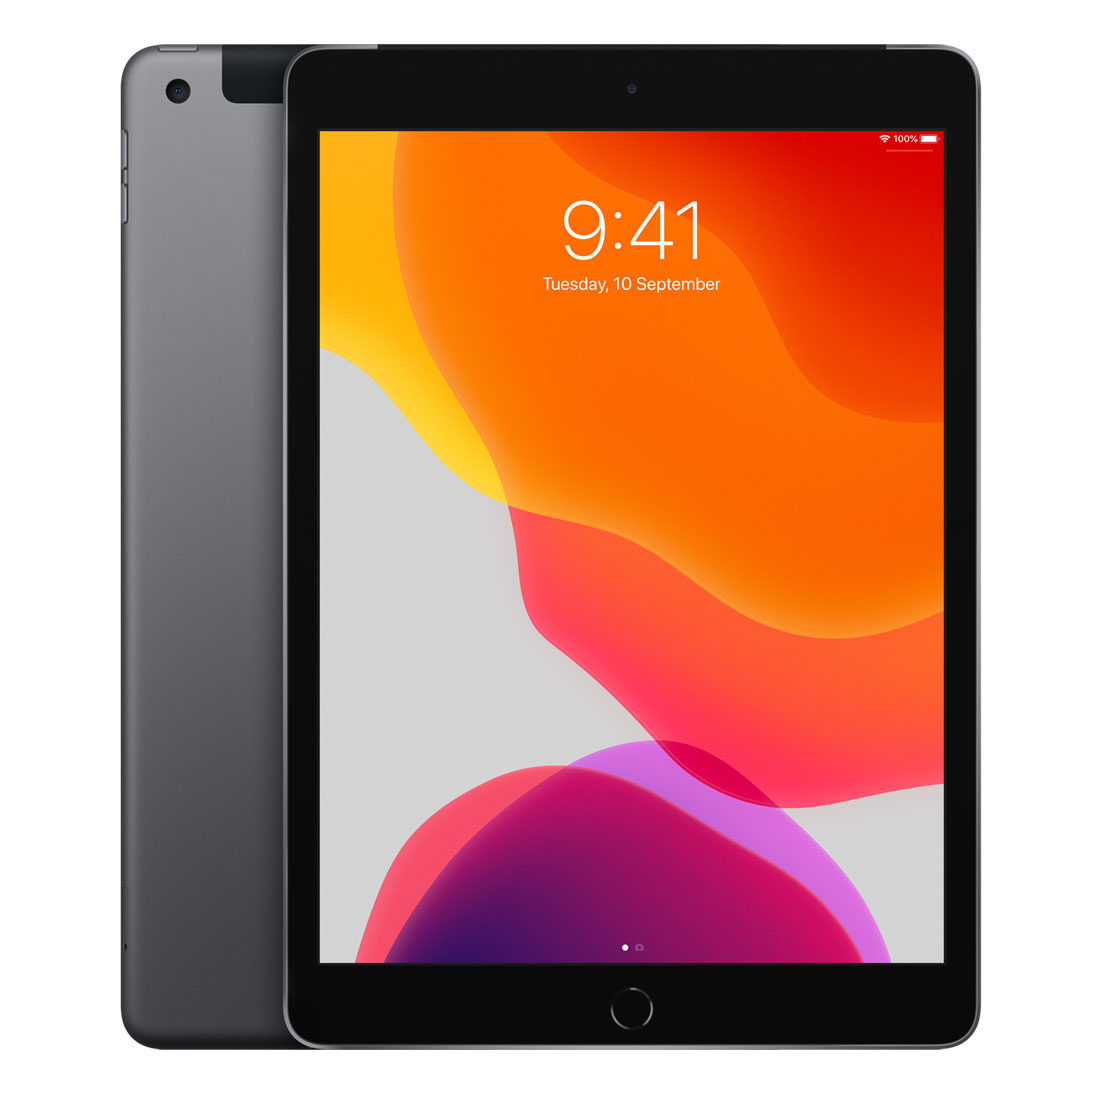 "Apple iPad (2019, Gen 7) 10.2"" WiFi + Cellular 32GB - Space Grey"